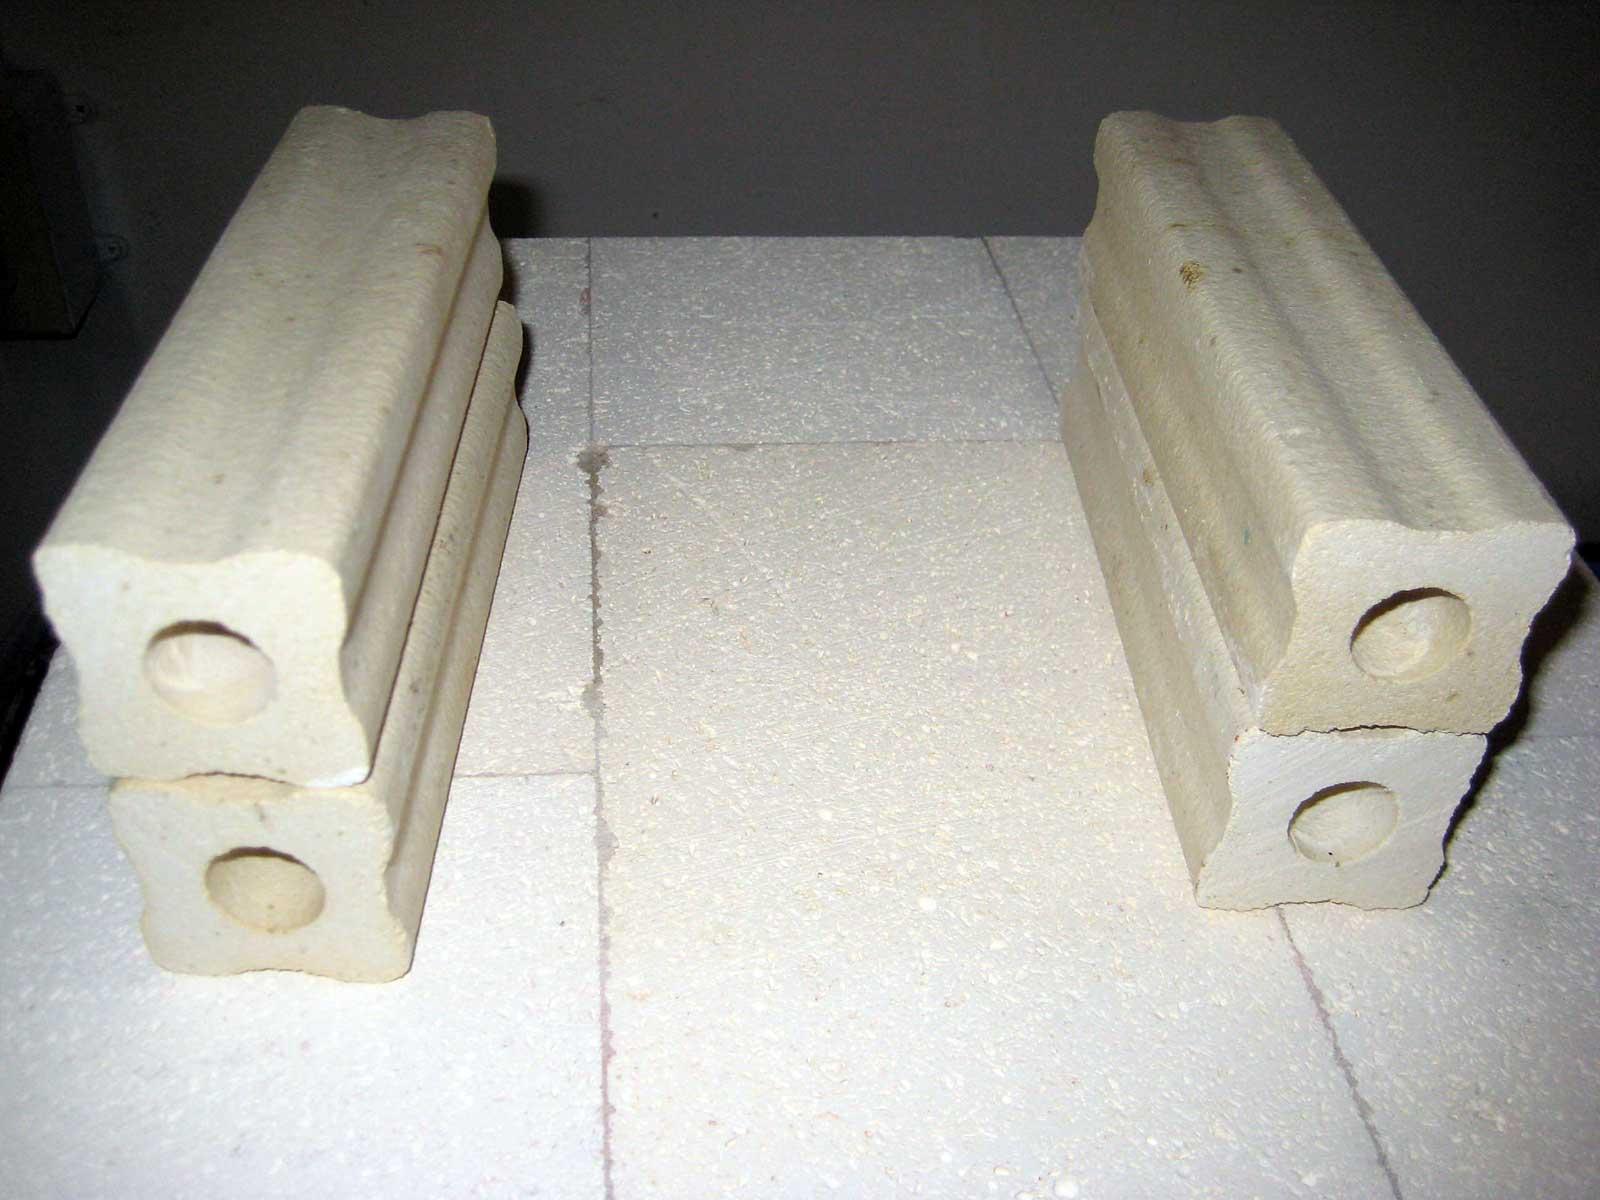 Beads of Clay Blog: Tool Talk Thursday: Small Kiln Bead Racks Part II